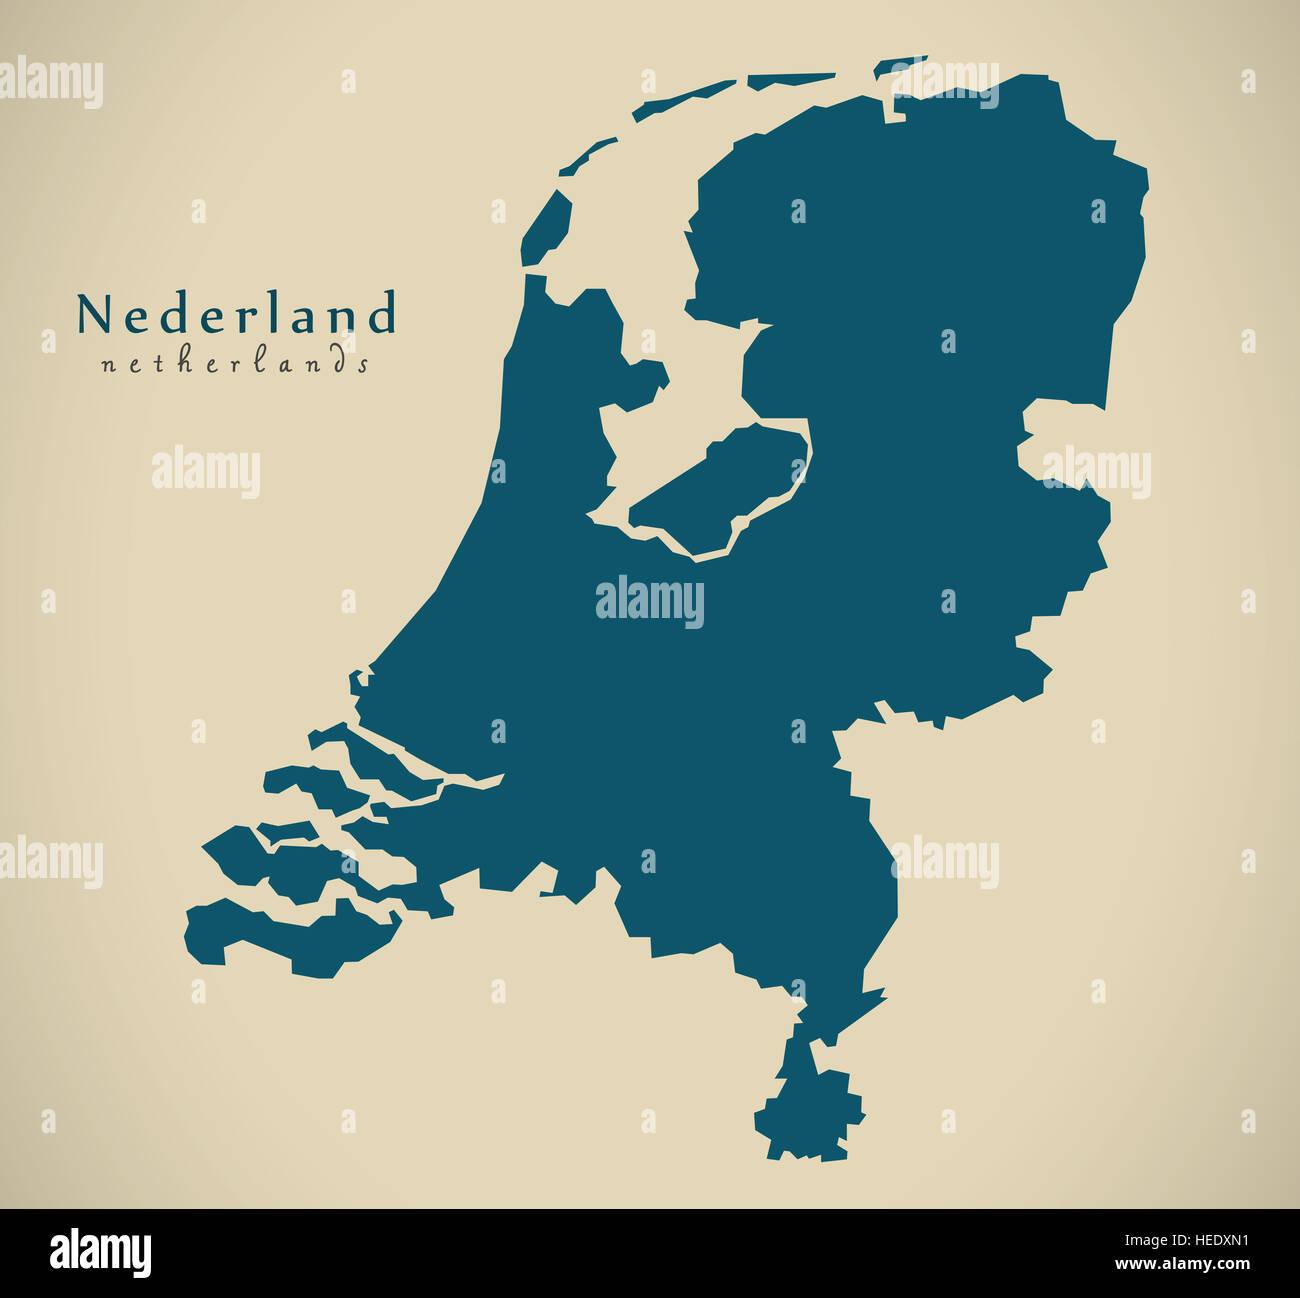 Netherlands Map Illustration Stock Photos & Netherlands Map ...